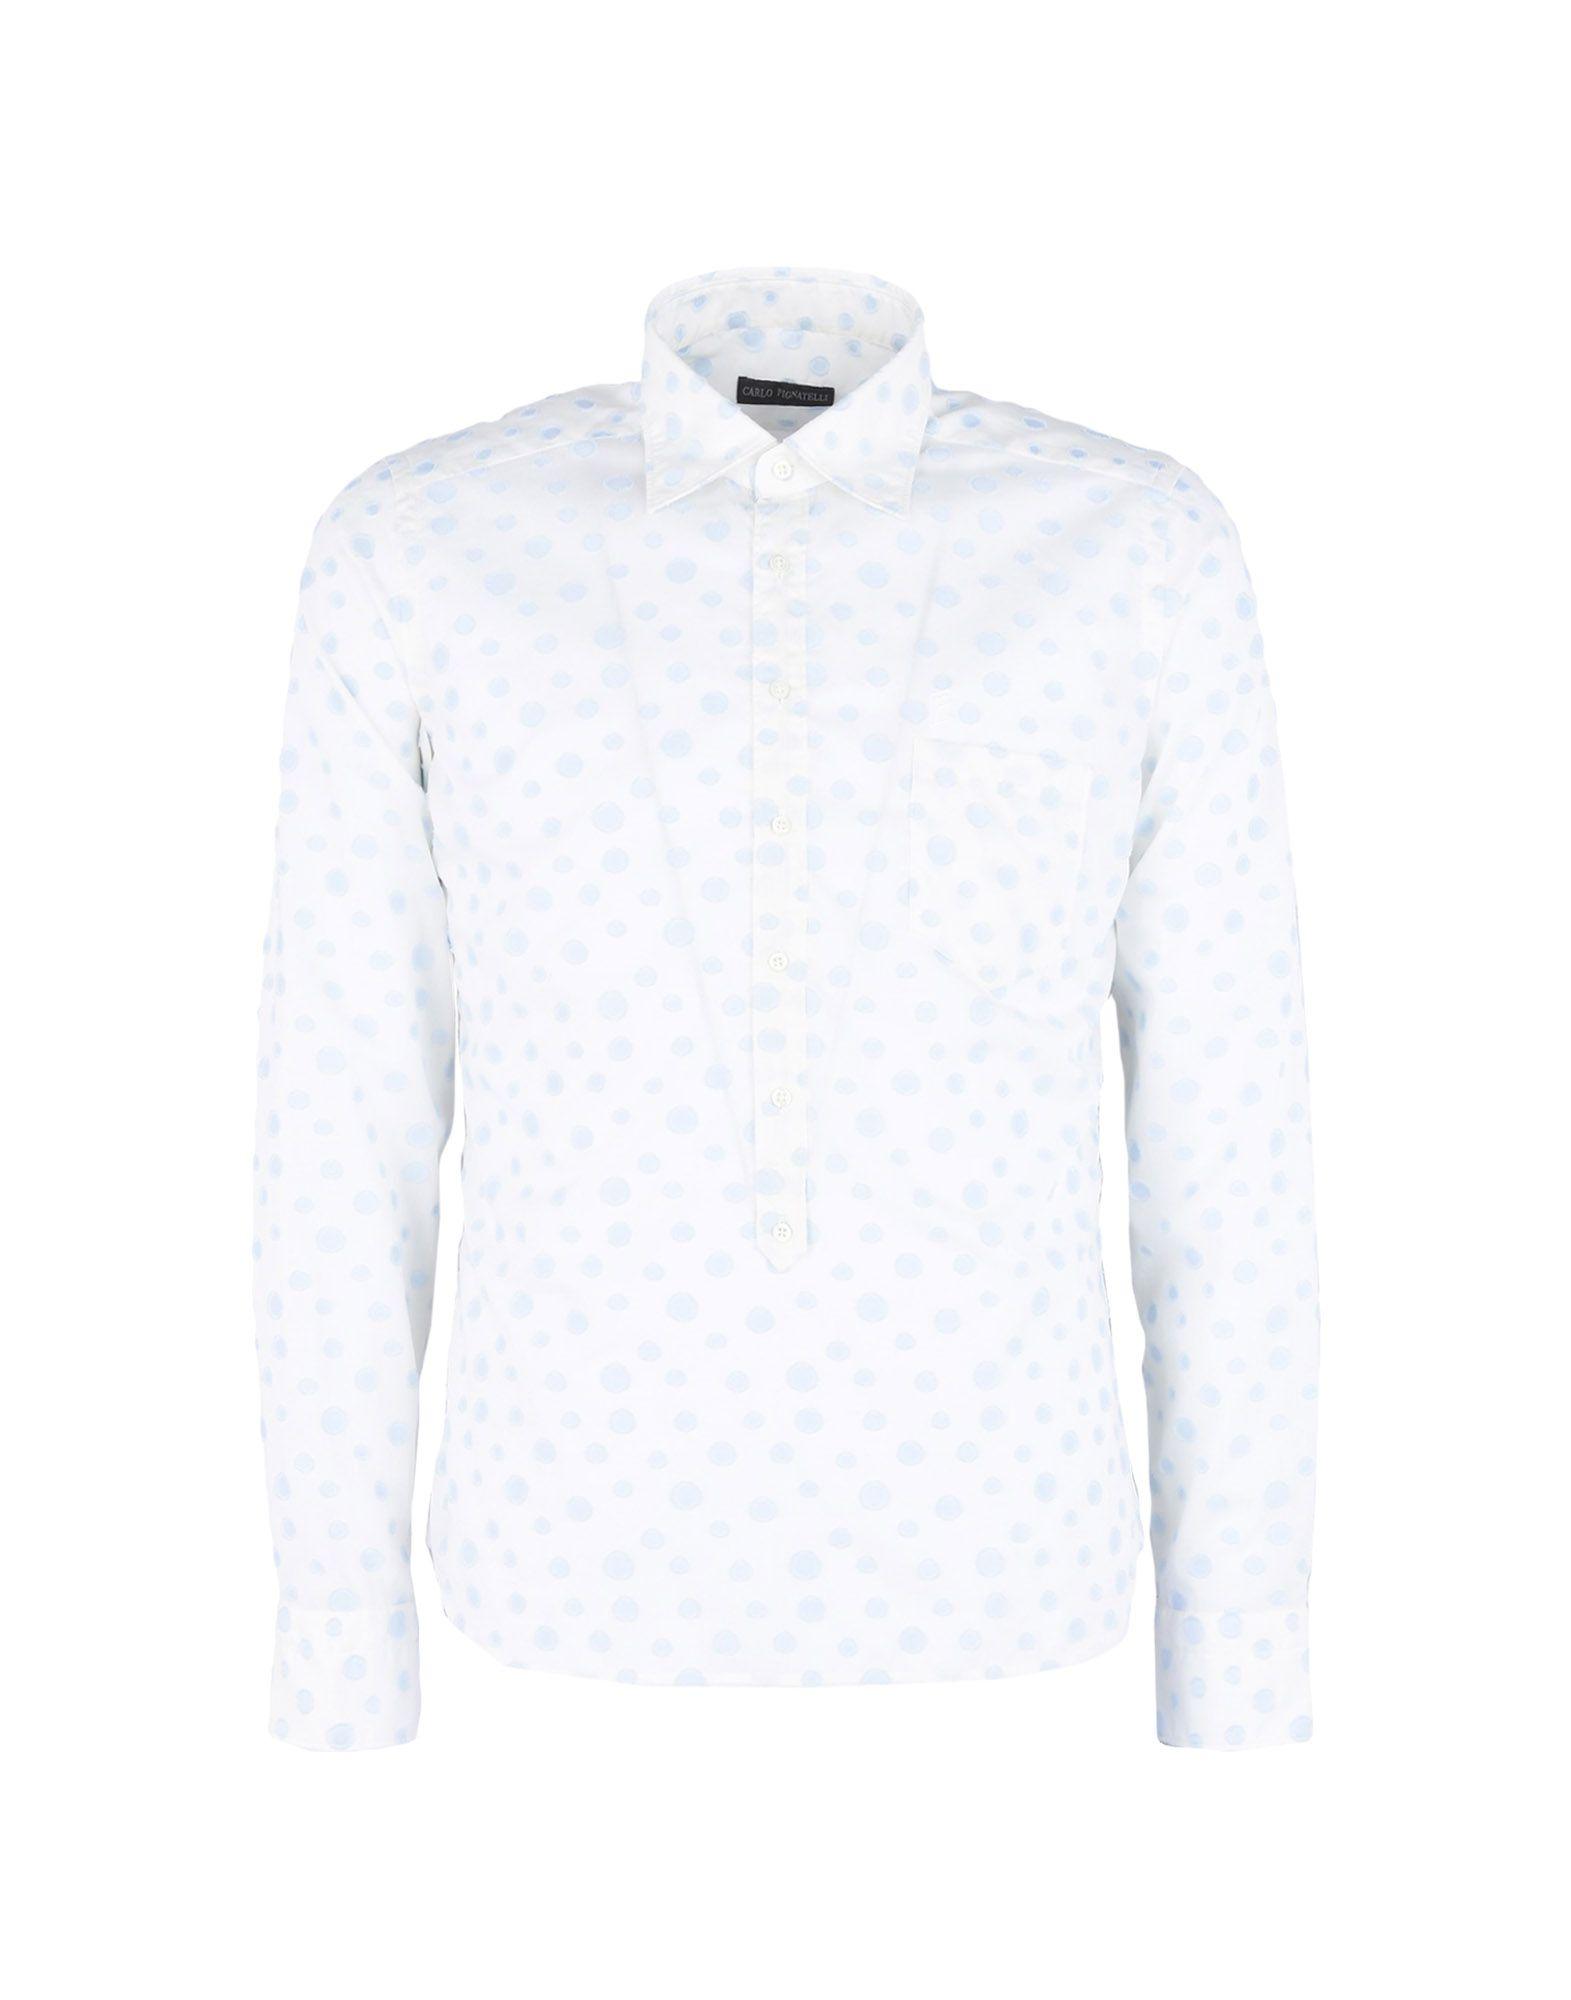 CARLO PIGNATELLI Patterned Shirt in Ivory